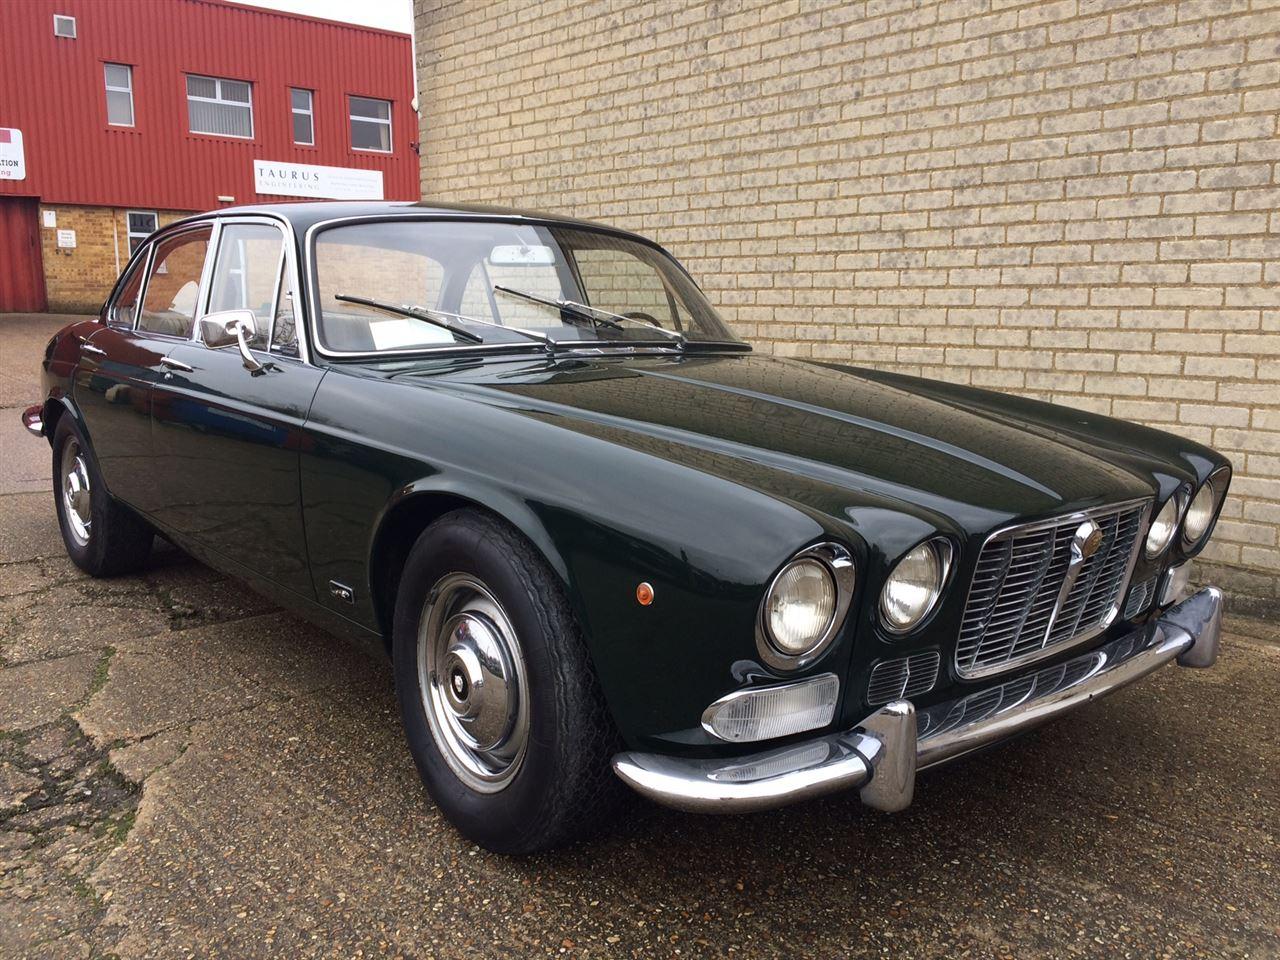 1969 Jaguar Series 1 XJ6 4.2